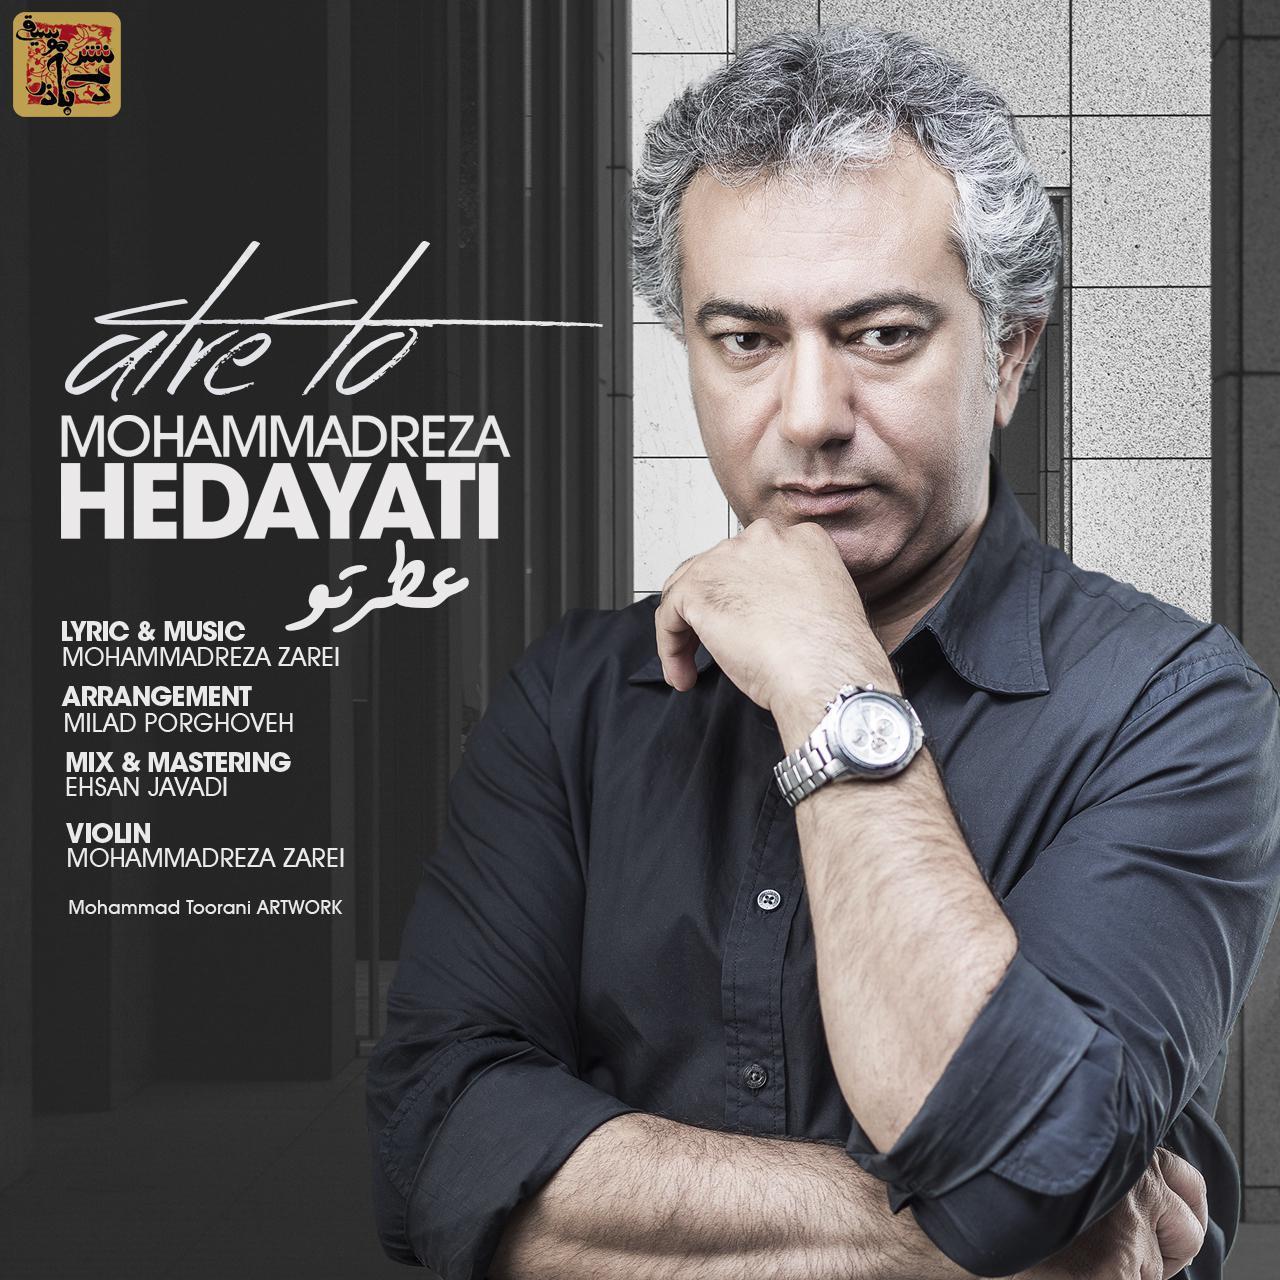 Mohammadreza Hedayati – Atre To